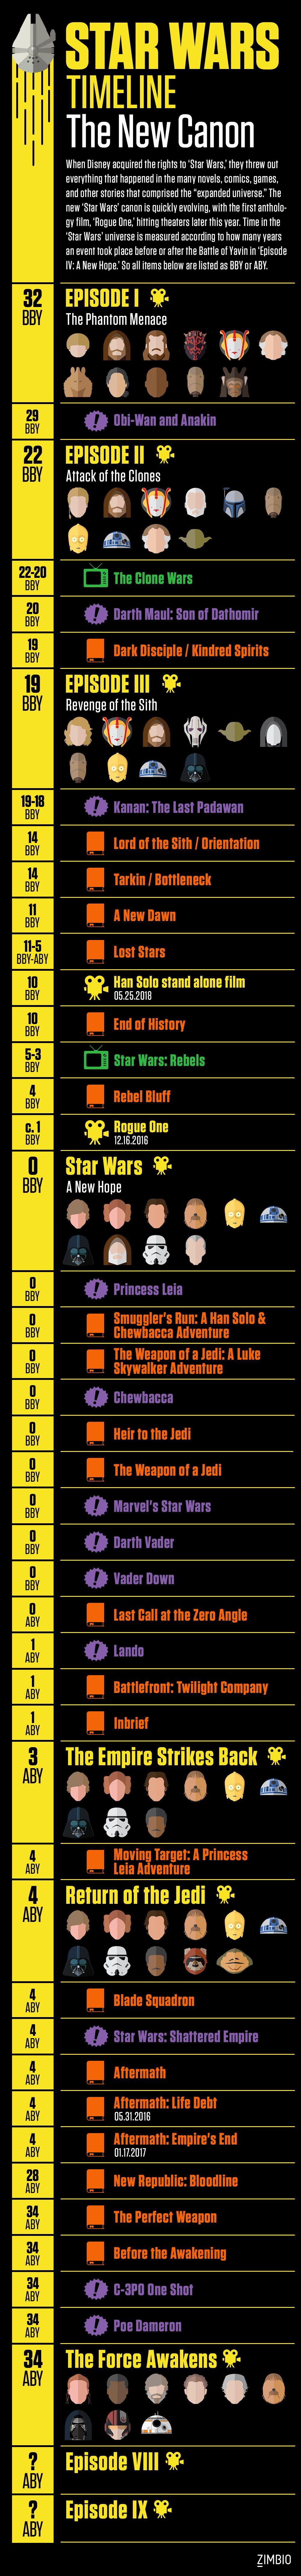 Star Wars Canon Timeline : canon, timeline, Comprehensive, Timeline, 'Star, Wars', Canon, Canon,, Timeline,